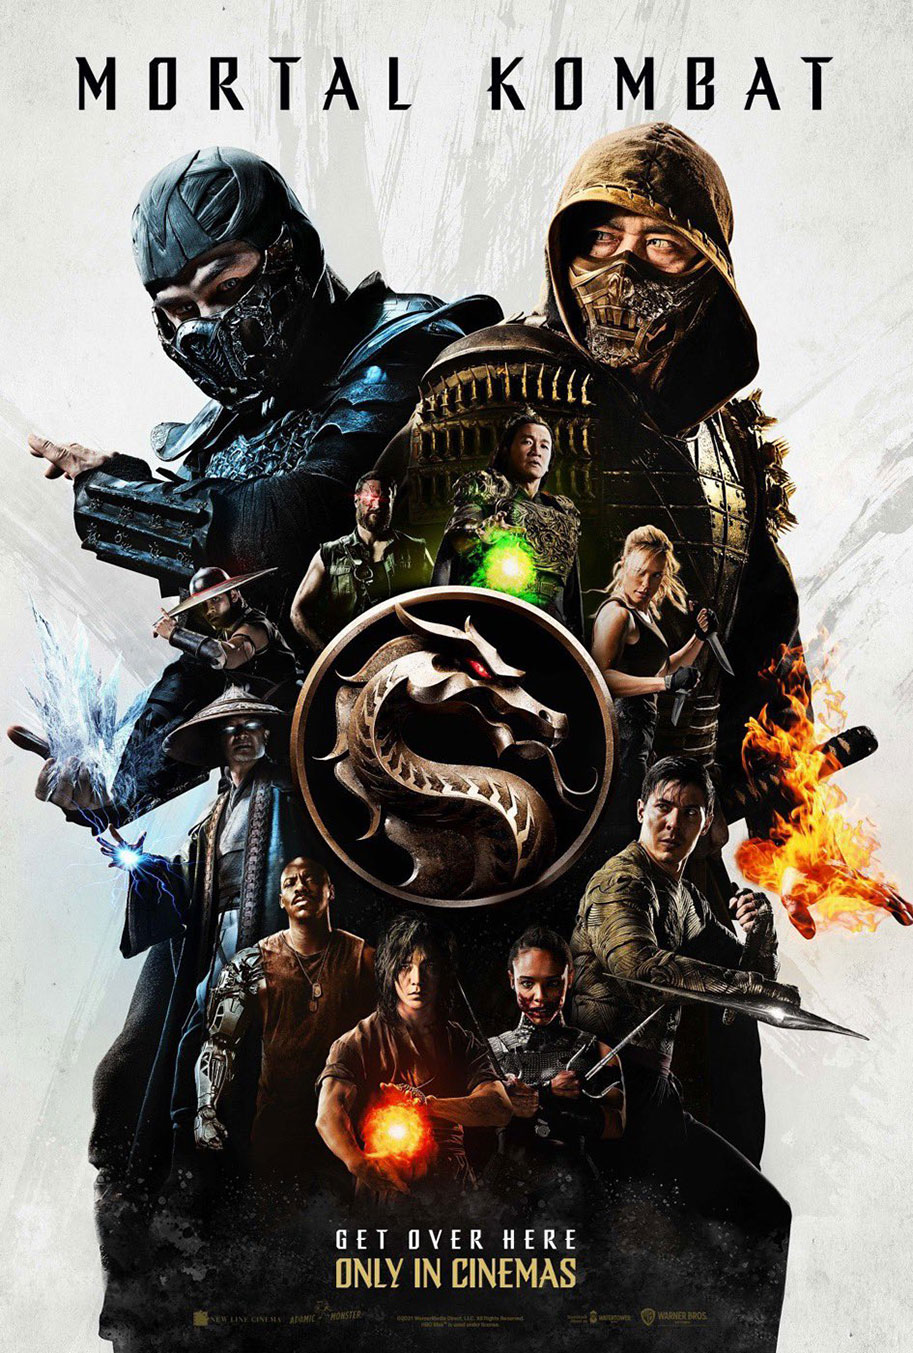 Mortal Kombat – Teaser Poster